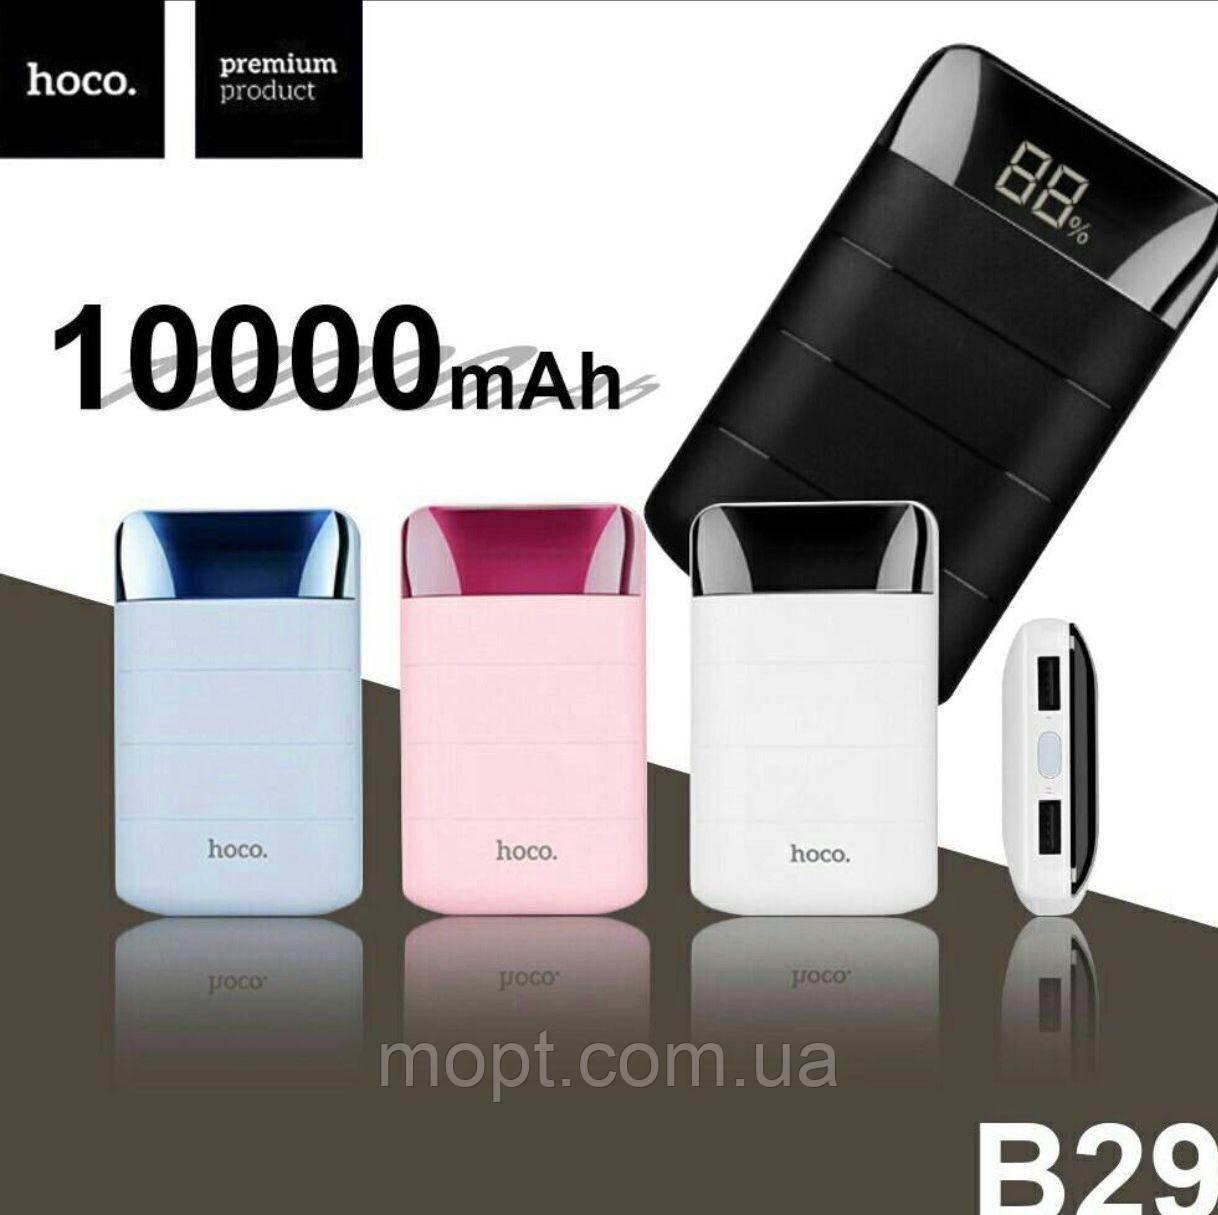 Power Bank HOCO Hoco B29 Domon 10000 mAh Портативная батарея Внешний Аккумулятор зарядное